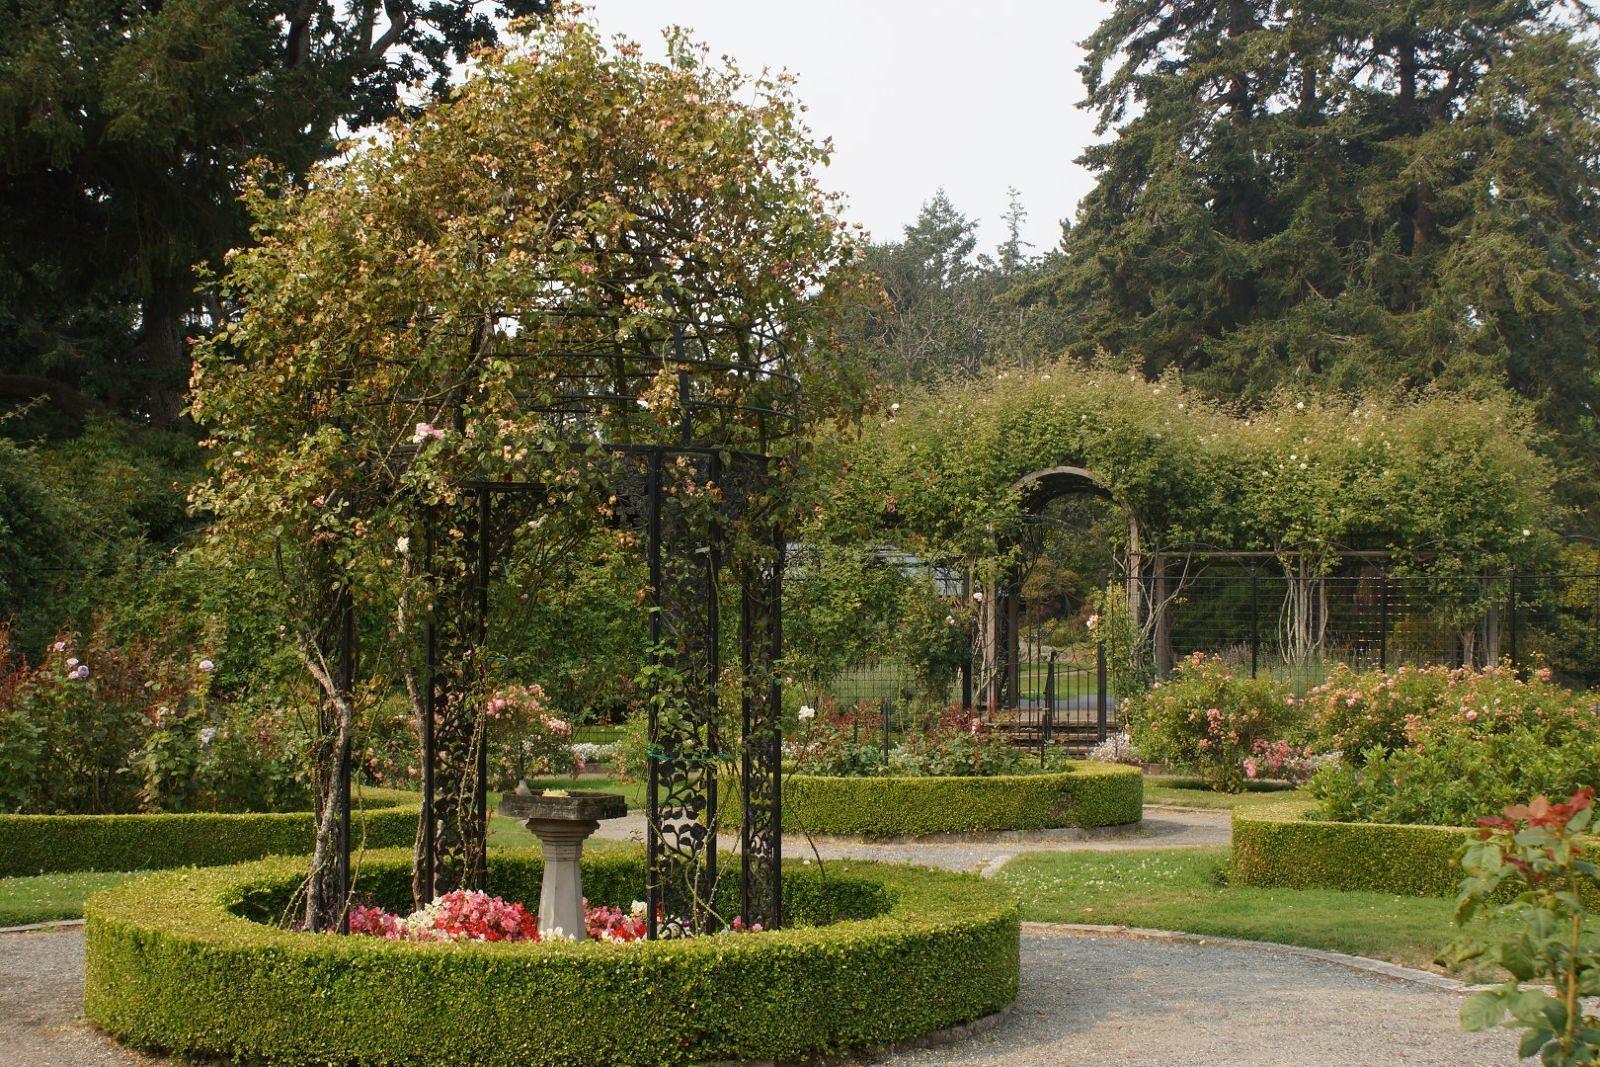 Garden Inspiration From British Columbia, Part 1 - FineGardening